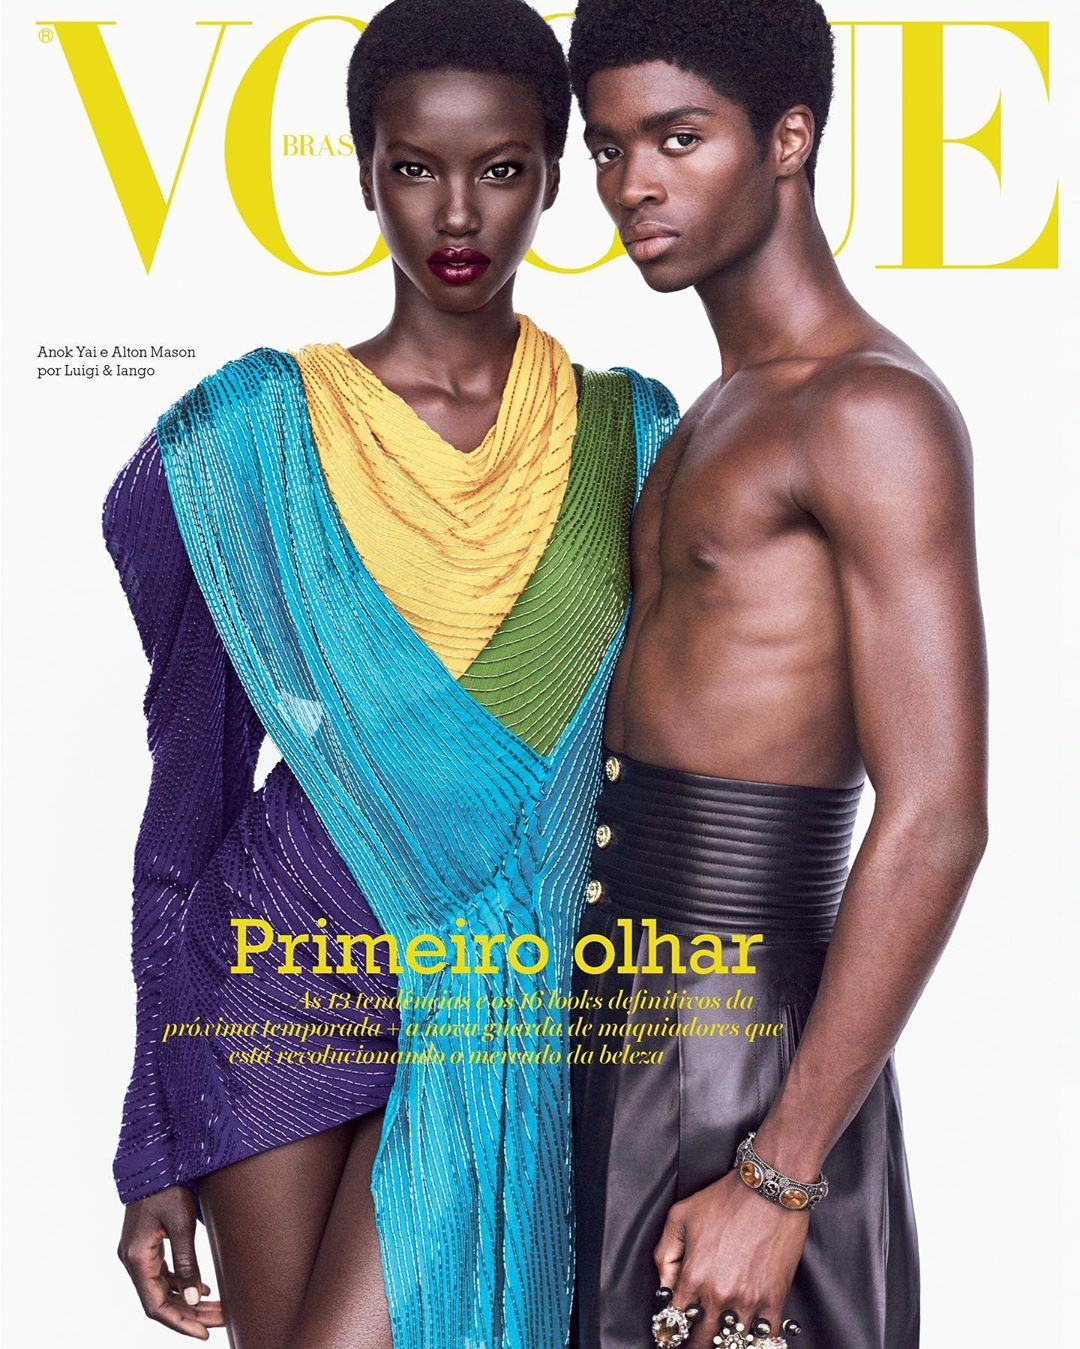 Anok Yai & Alton Mason shine on Vogue Brasil's August 2019 Issue!